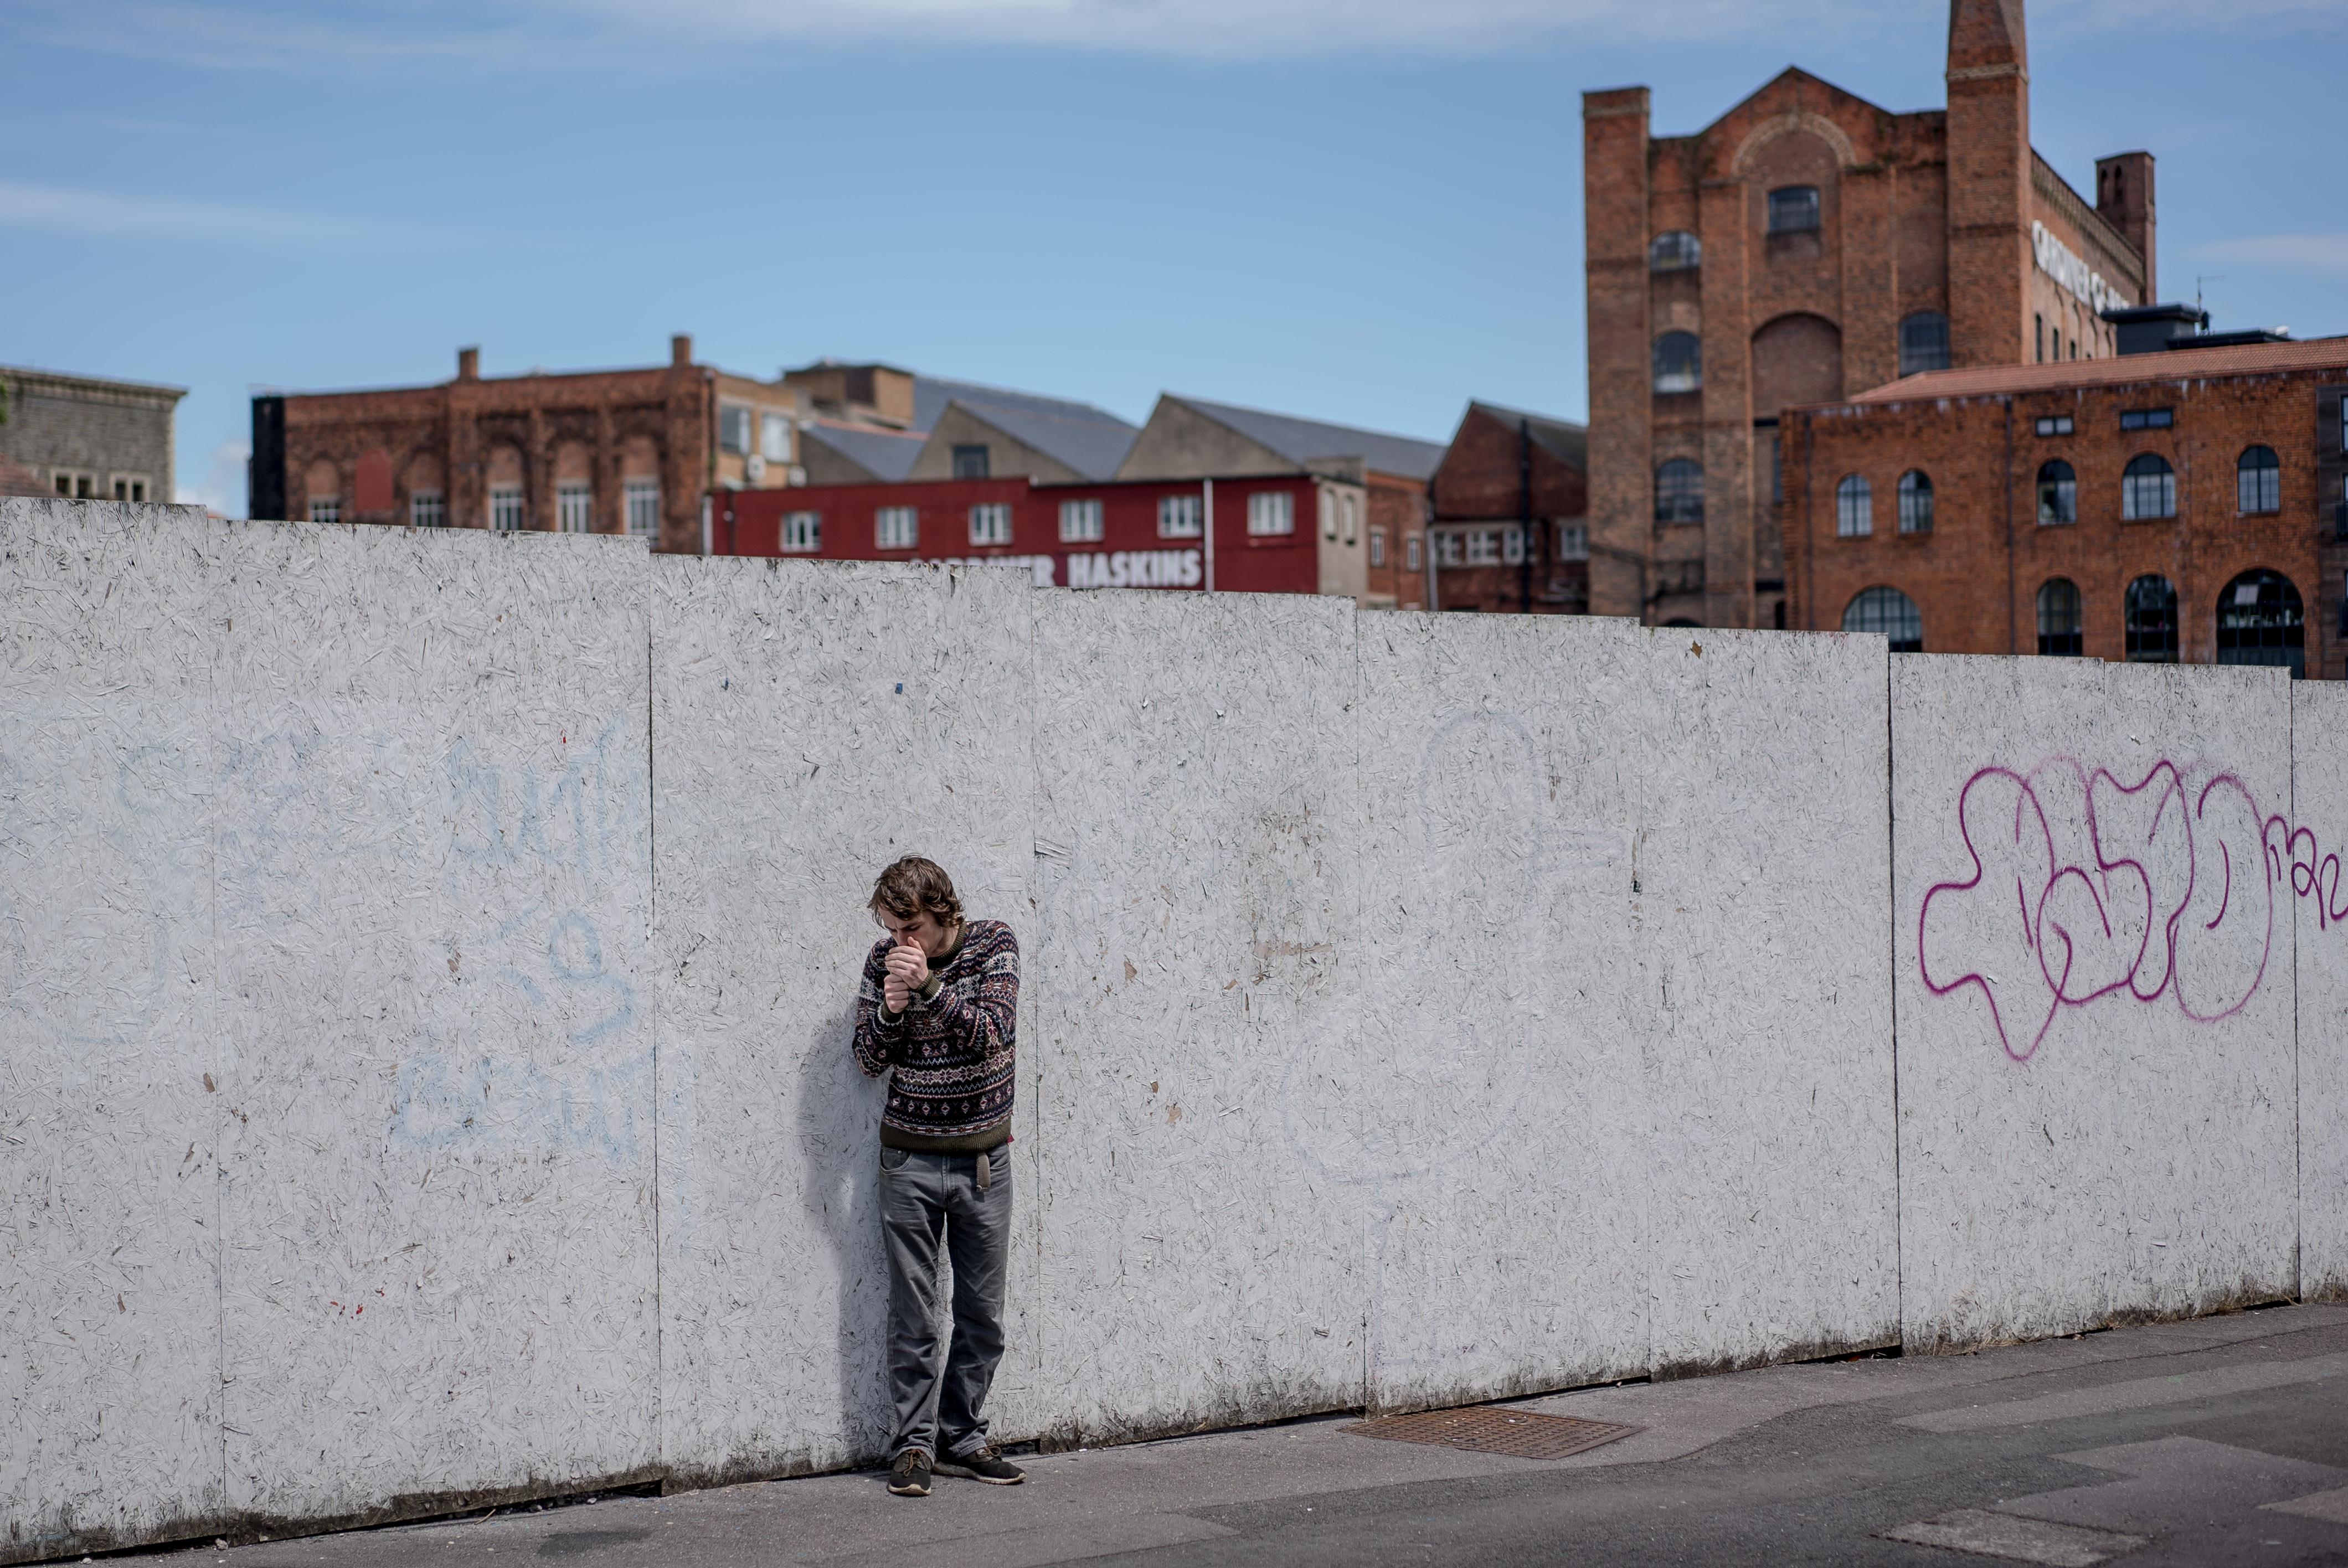 UK. Bristol. 7th June 2017Josh Walker photographed in BristolAndrew Testa for the Intercept